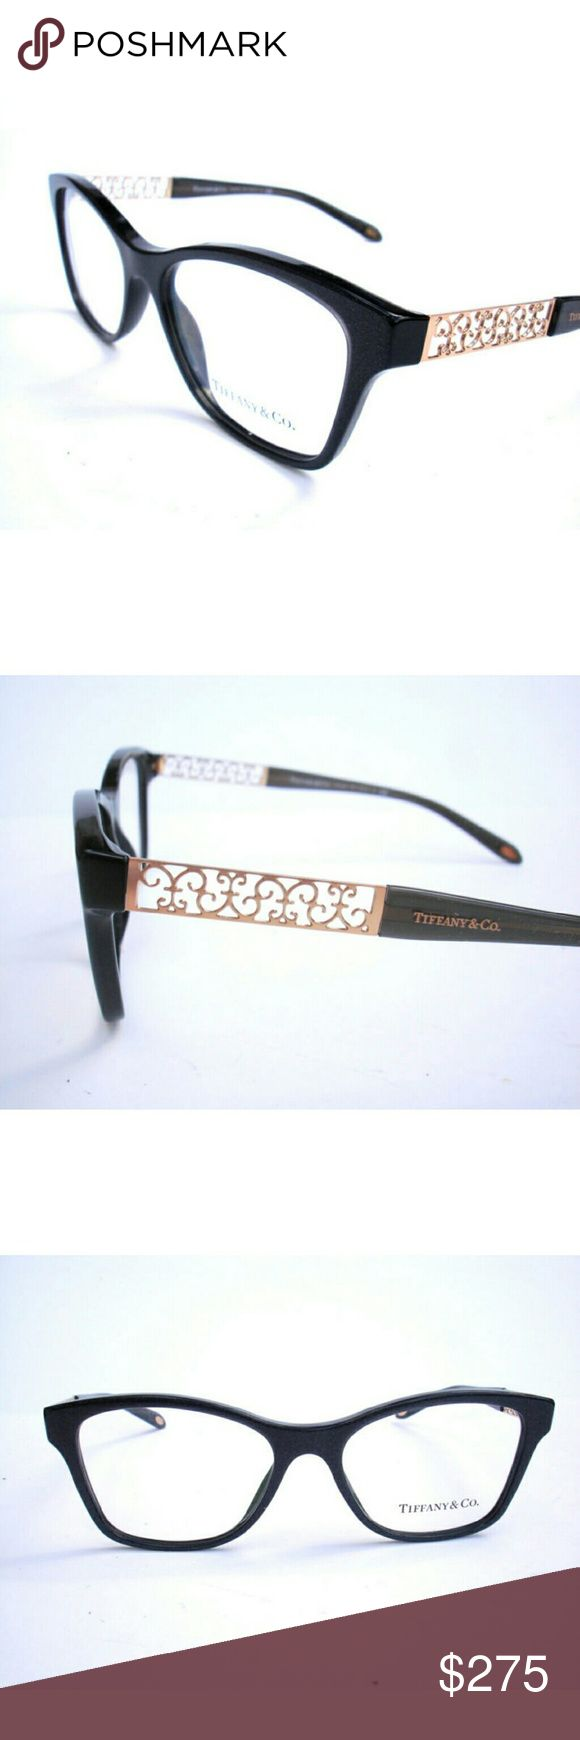 35 best Tiffany & Co images on Pinterest | Glasses, Eye glasses and ...